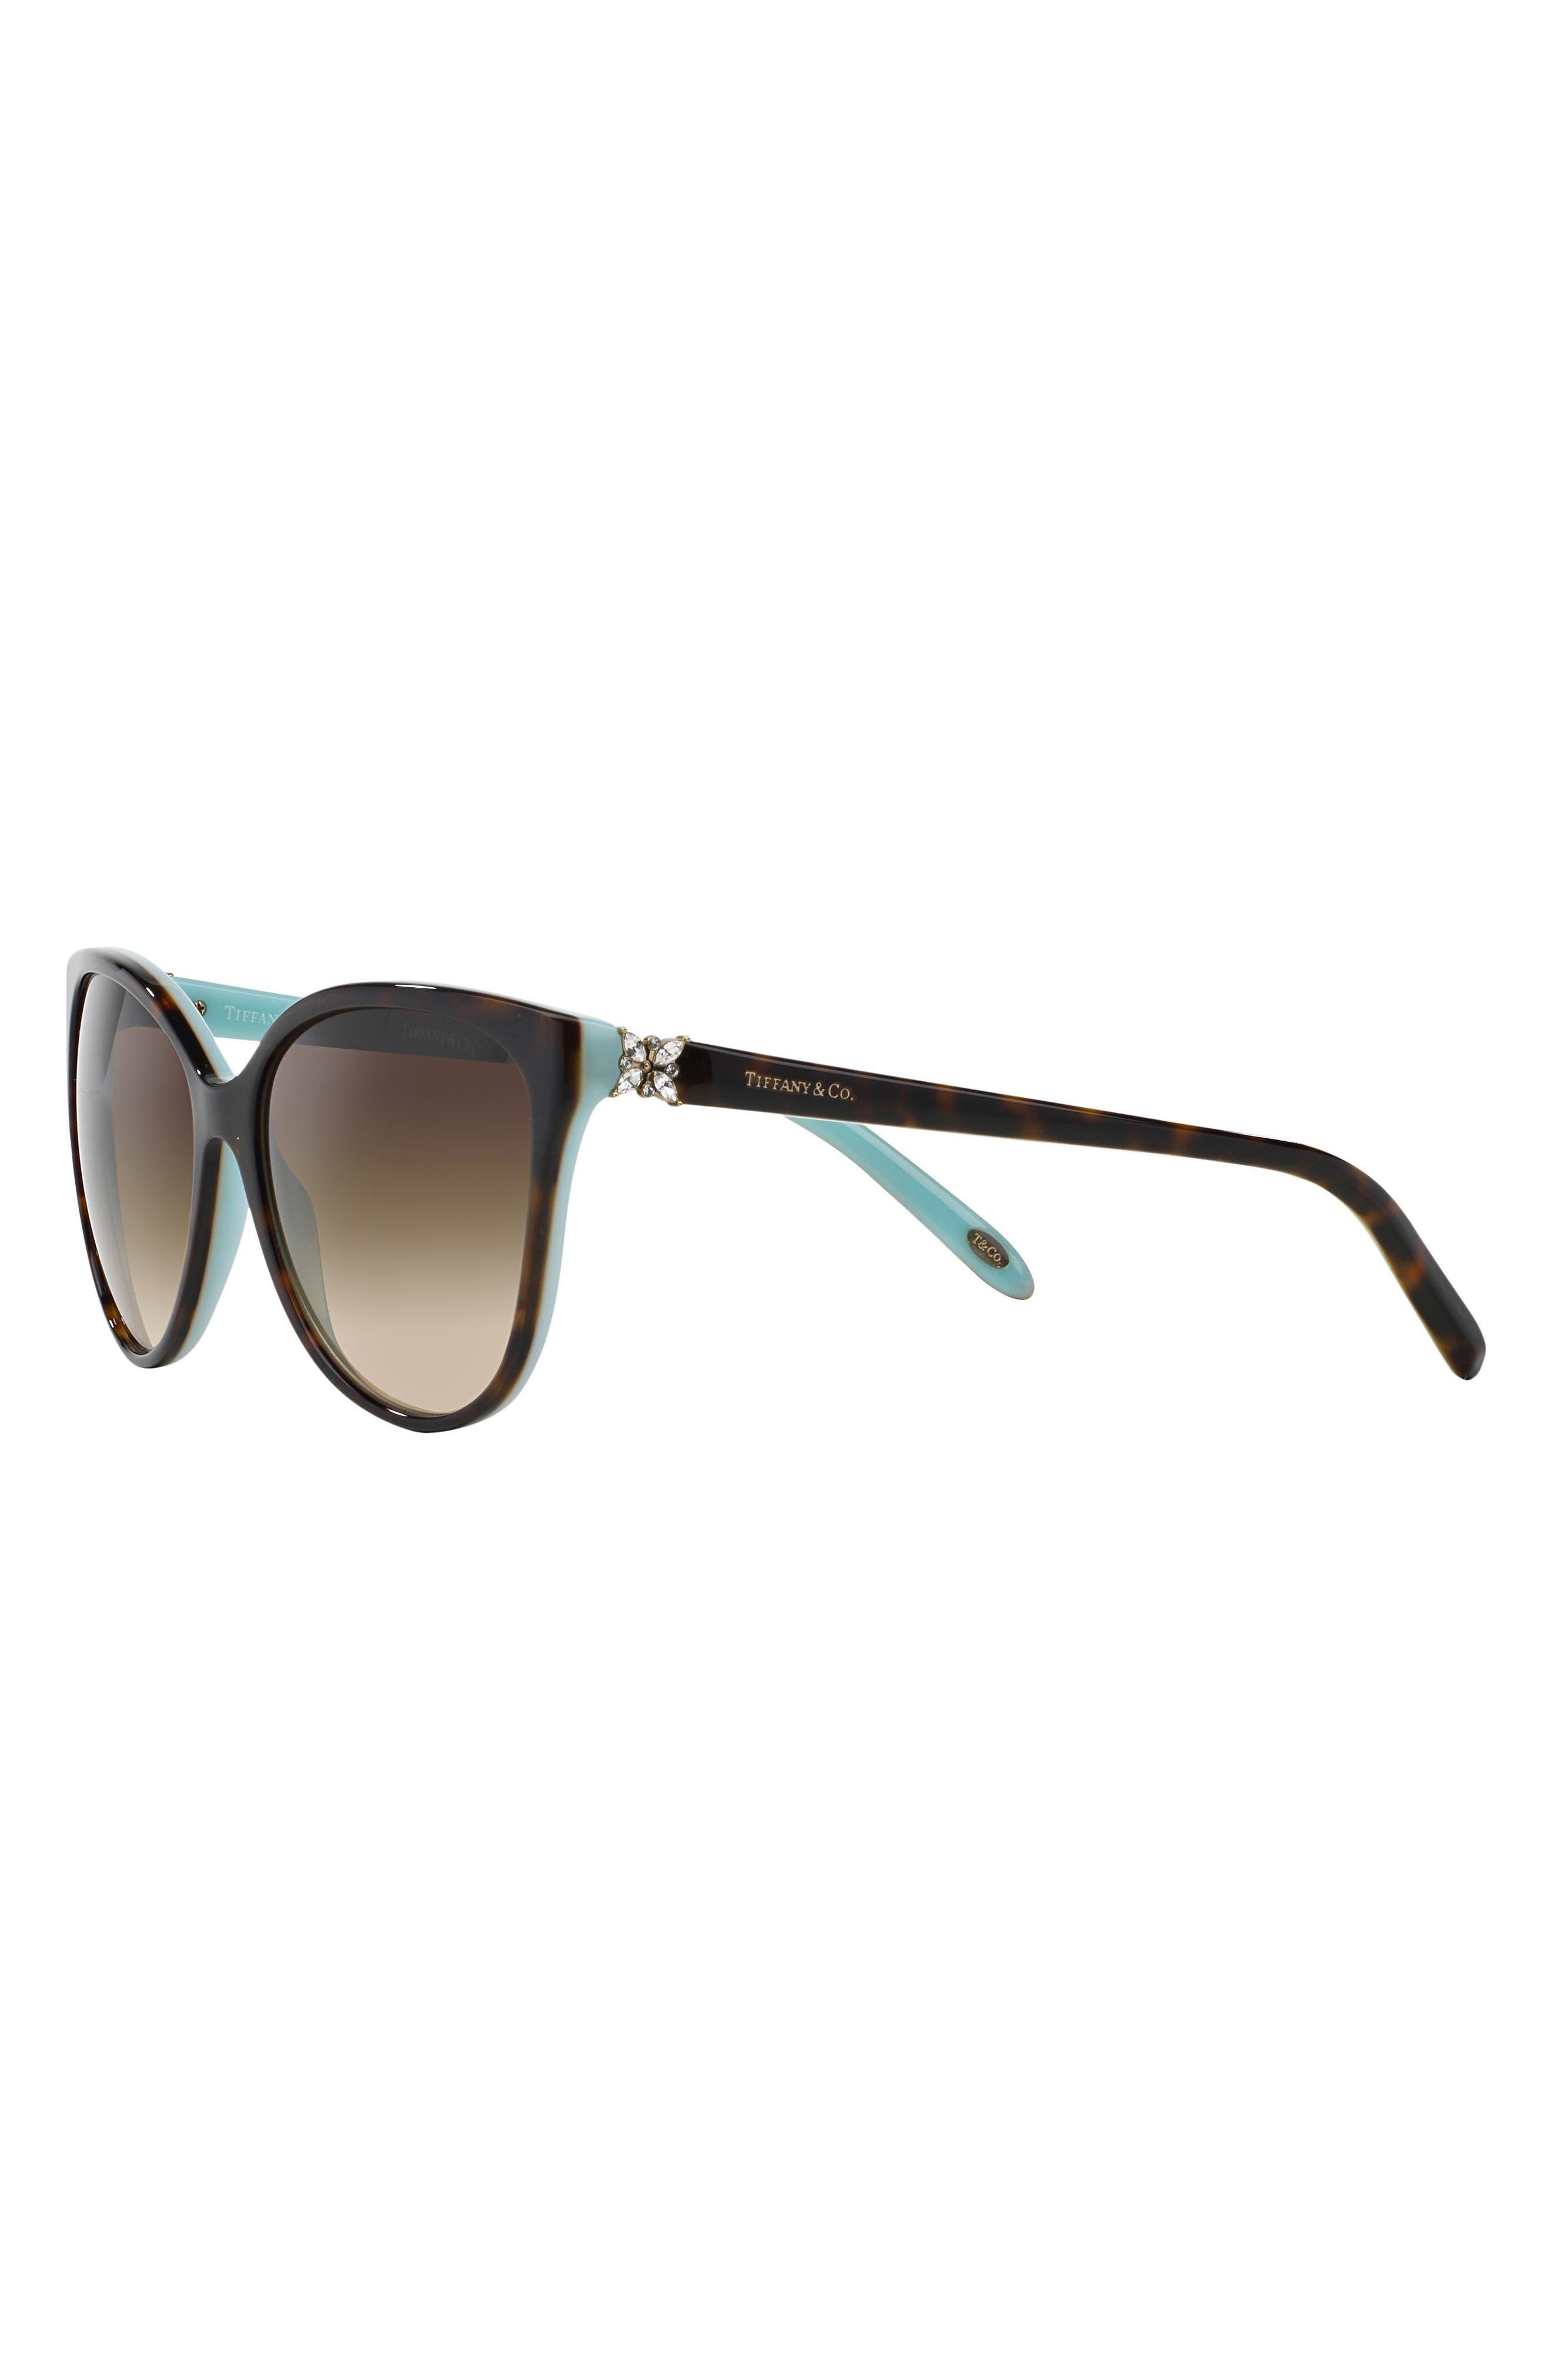 58mm Gradient Cat Eye Sunglasses,                             Alternate thumbnail 3, color,                             Havana